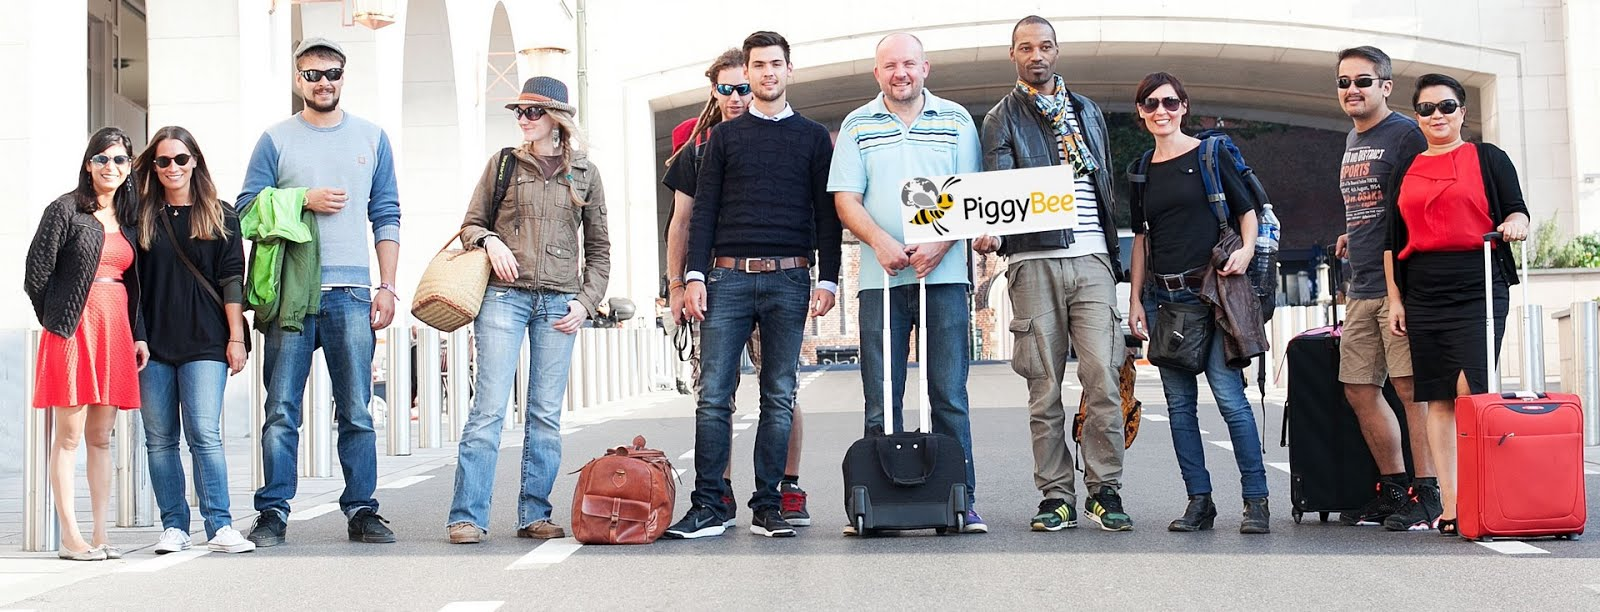 PiggyBee - The Crowdshipping Community